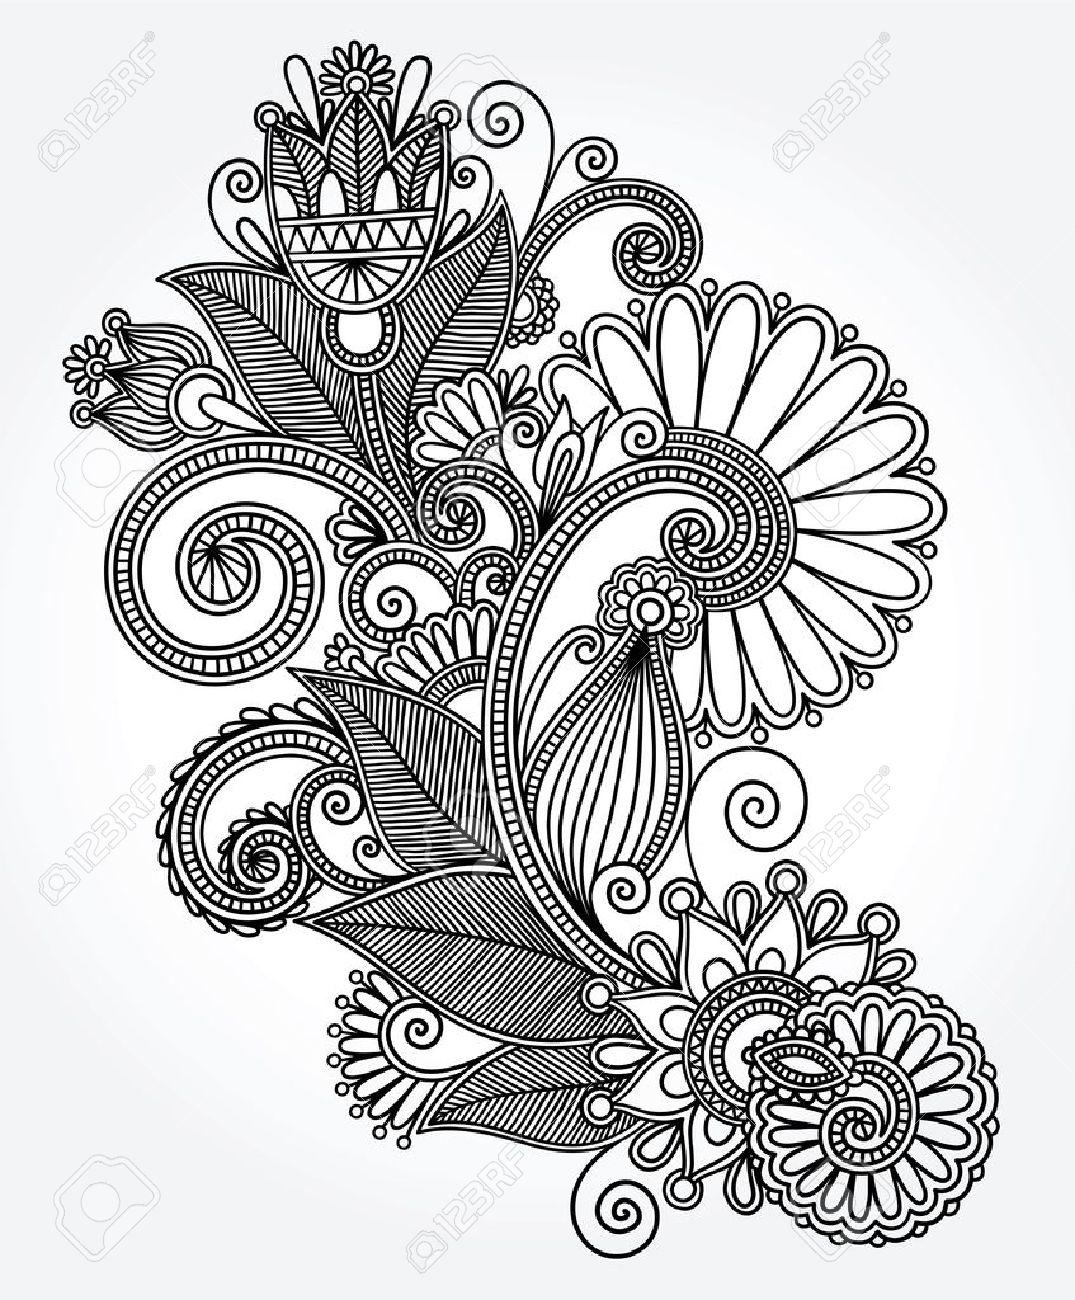 original hand draw line art ornate flower design  Ukrainian traditional style Stock Vector - 14689036